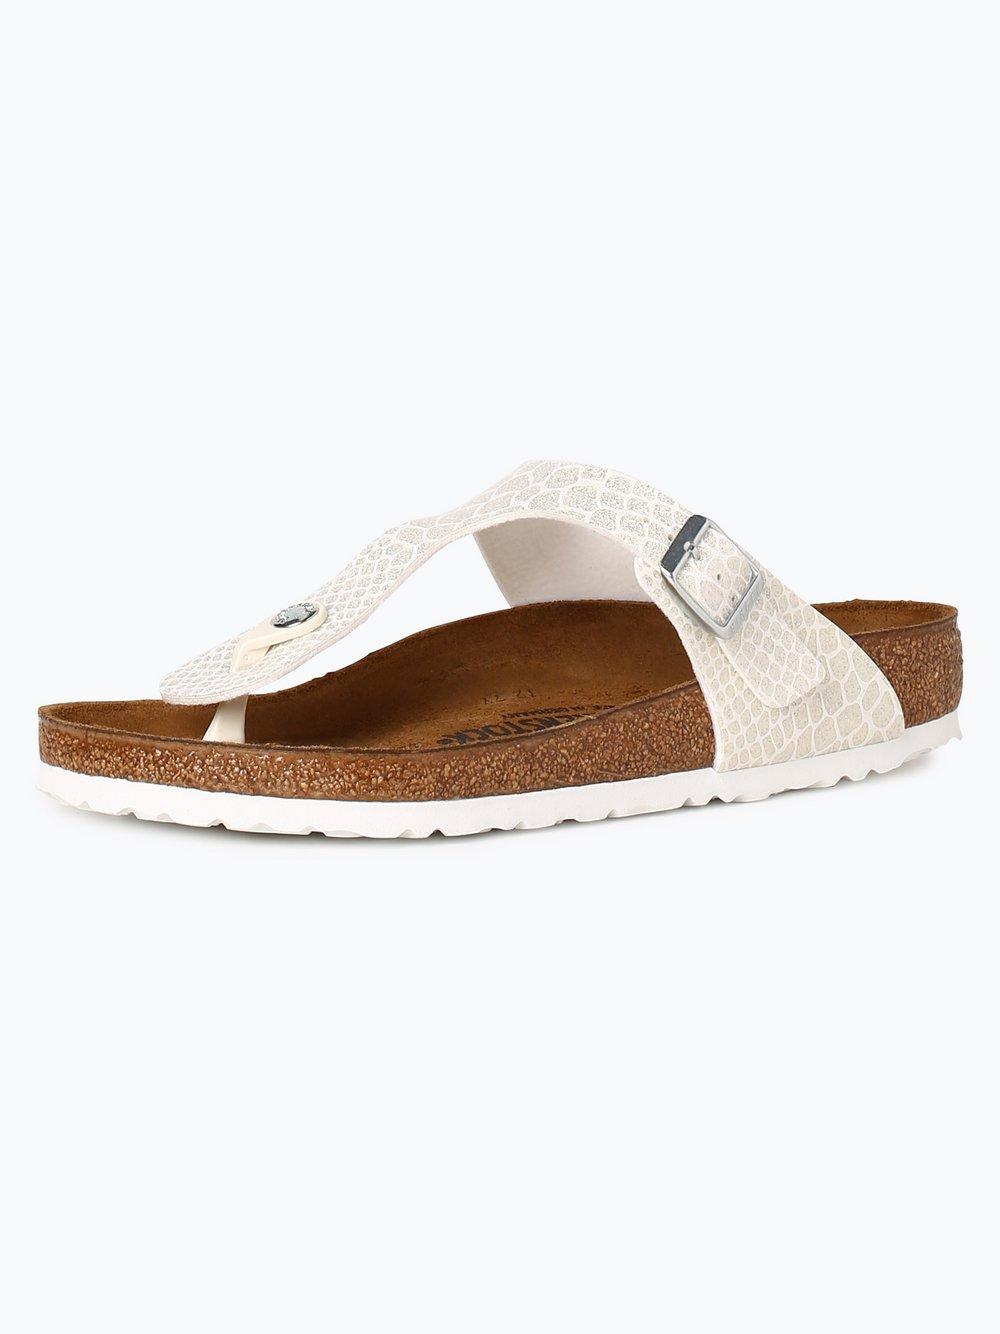 Birkenstock Damen Sandalen mit Leder Anteil Gizeh BS